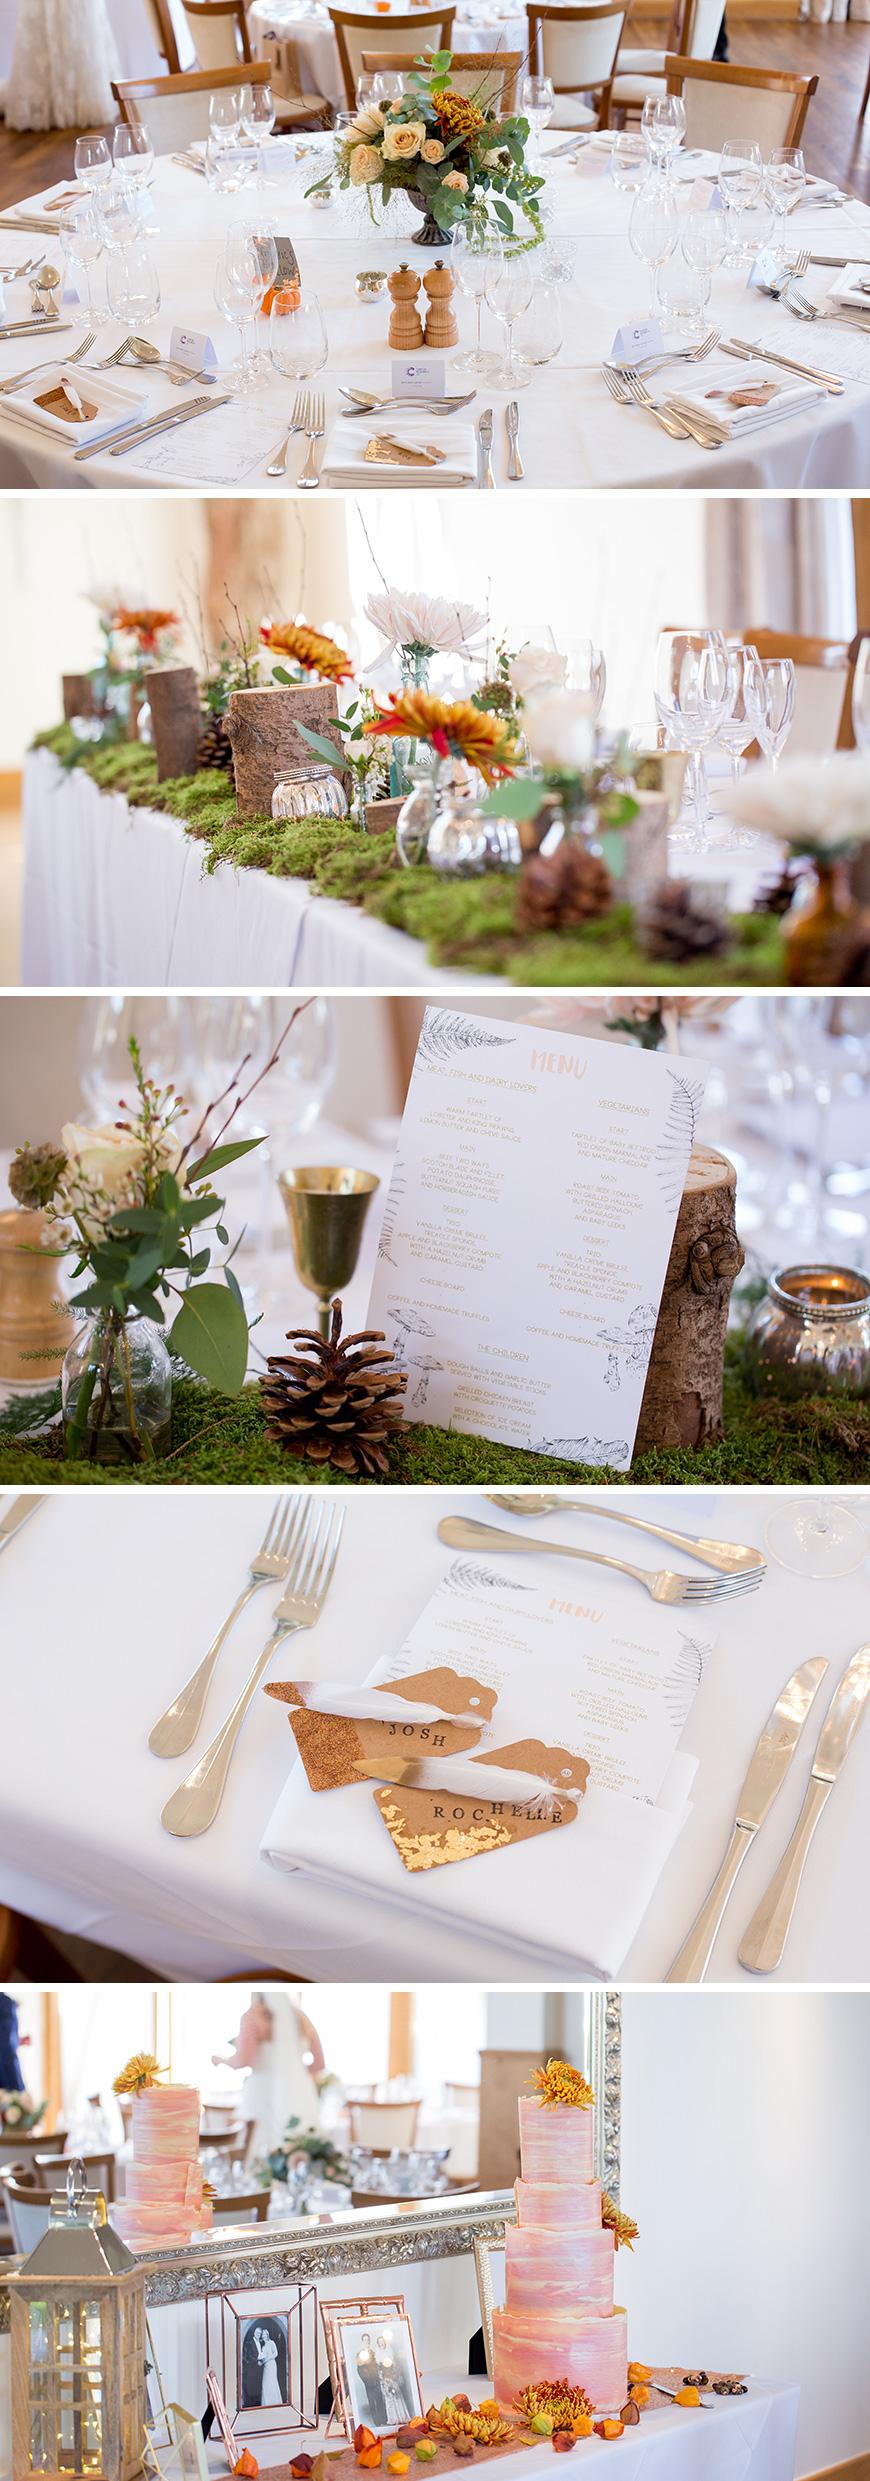 Real Wedding - Rochelle and Joshua's Bohemian Autumn Wedding at Mythe Barn | CHWV